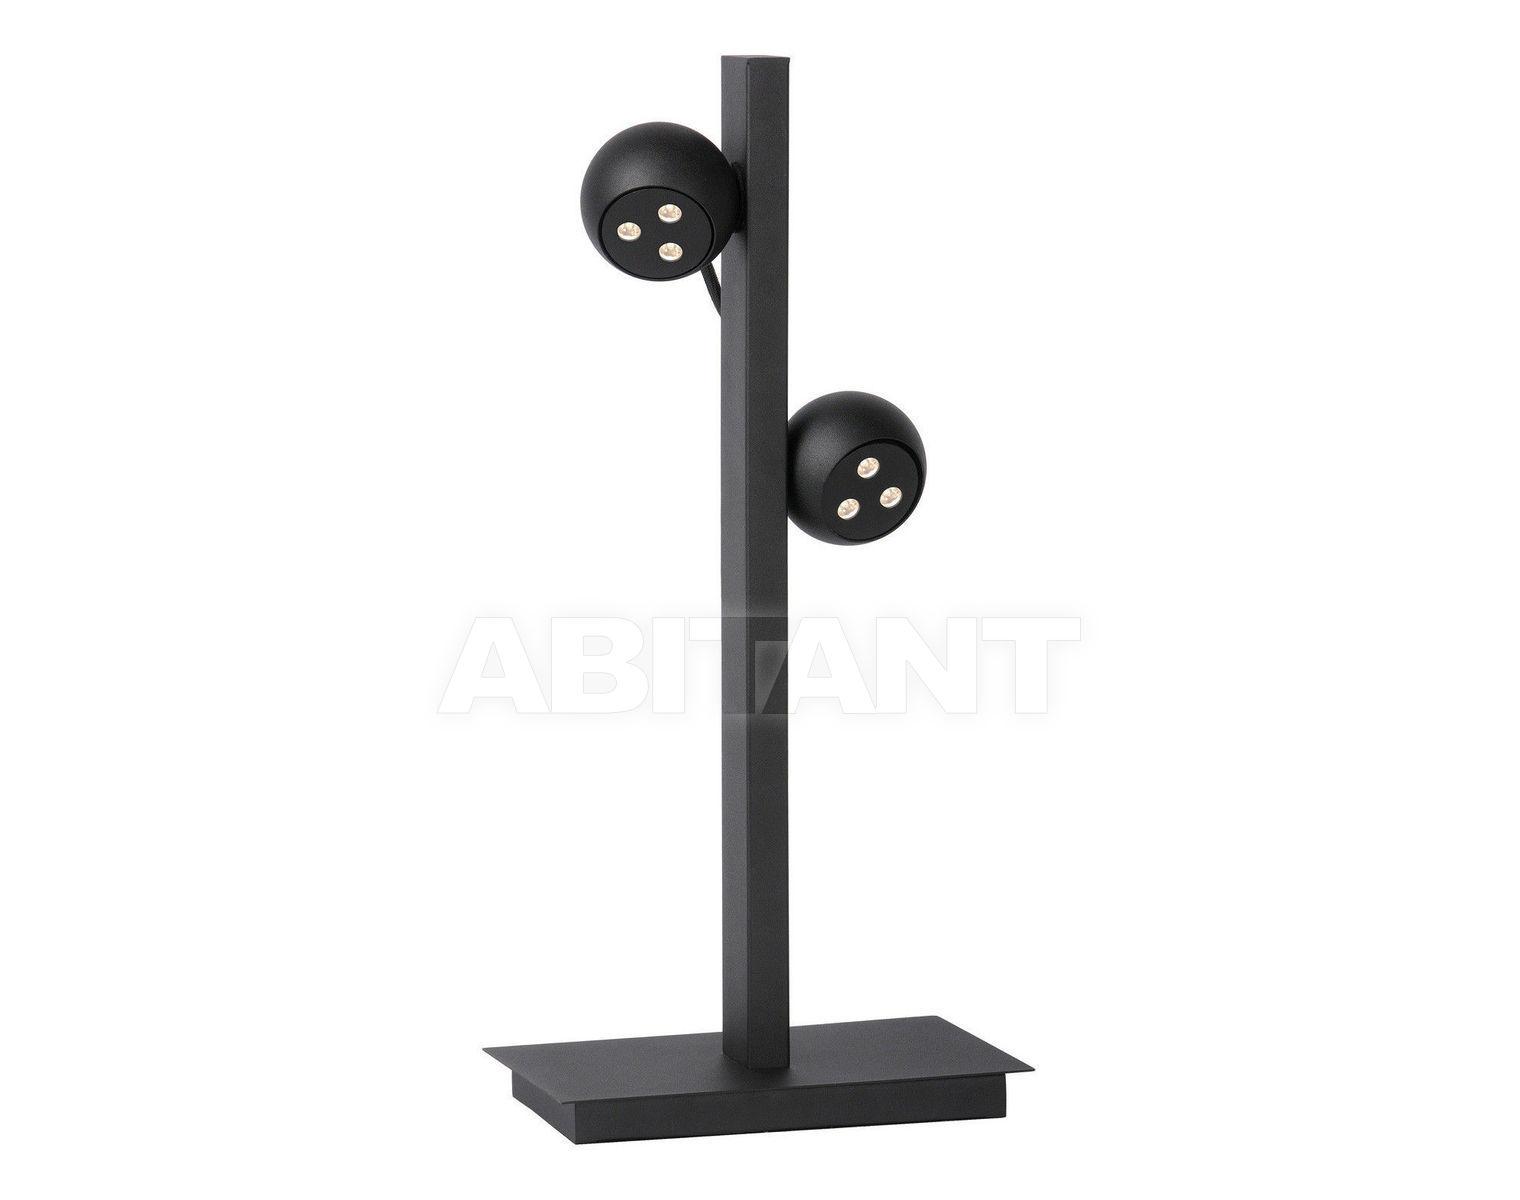 Купить Лампа настольная MAGNET SPOT Lucide  Floor & Table Lamps 12544/22/30